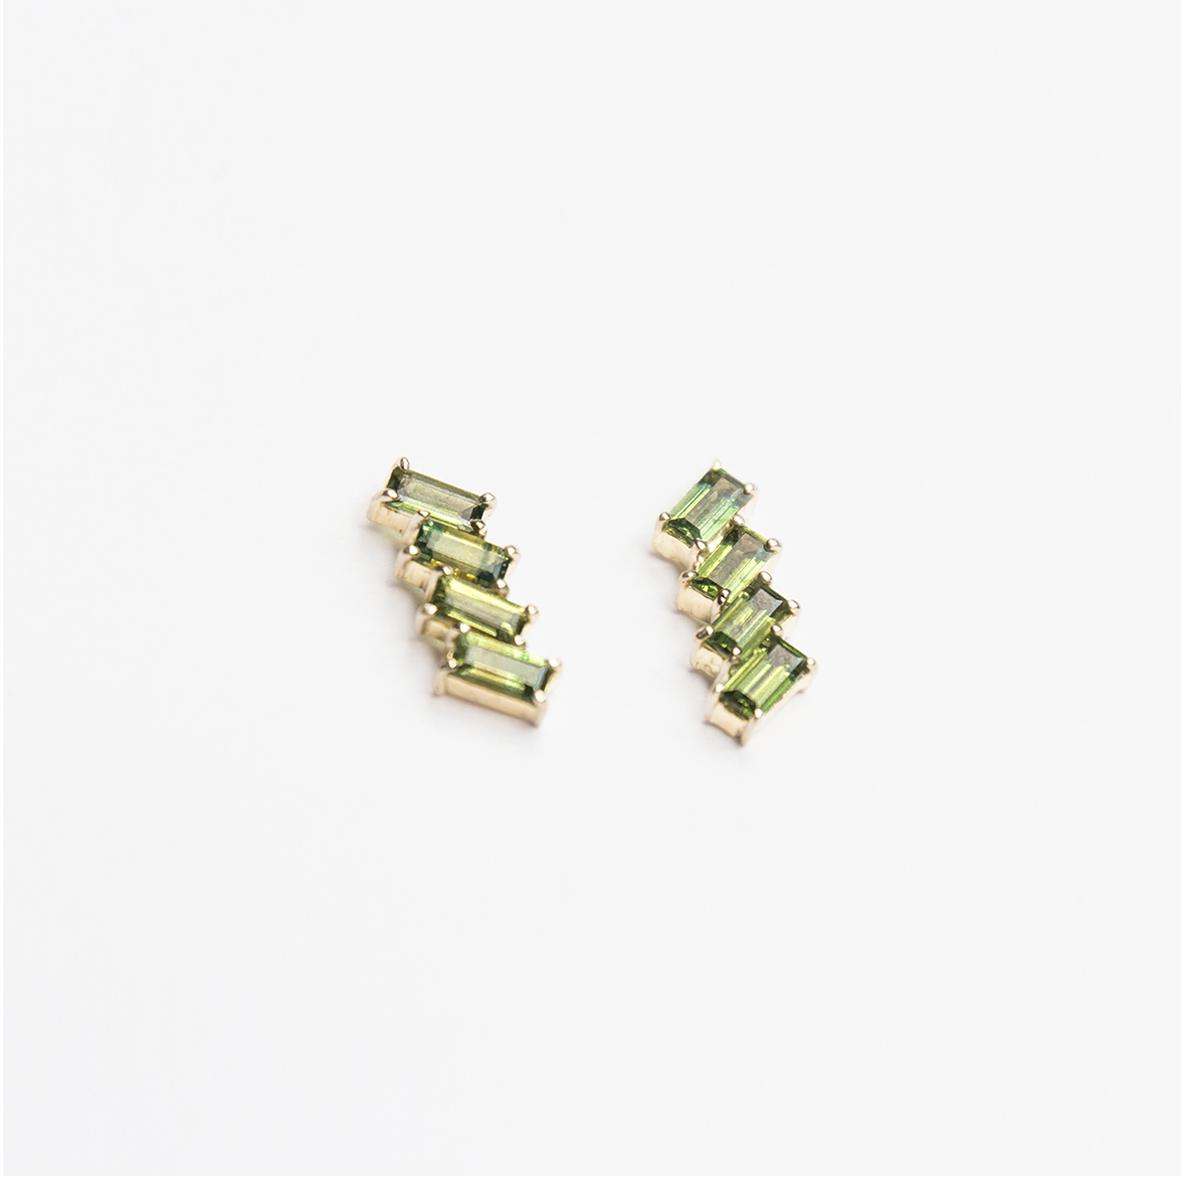 7. OONA_philo_principal_deco green sapphire earrings